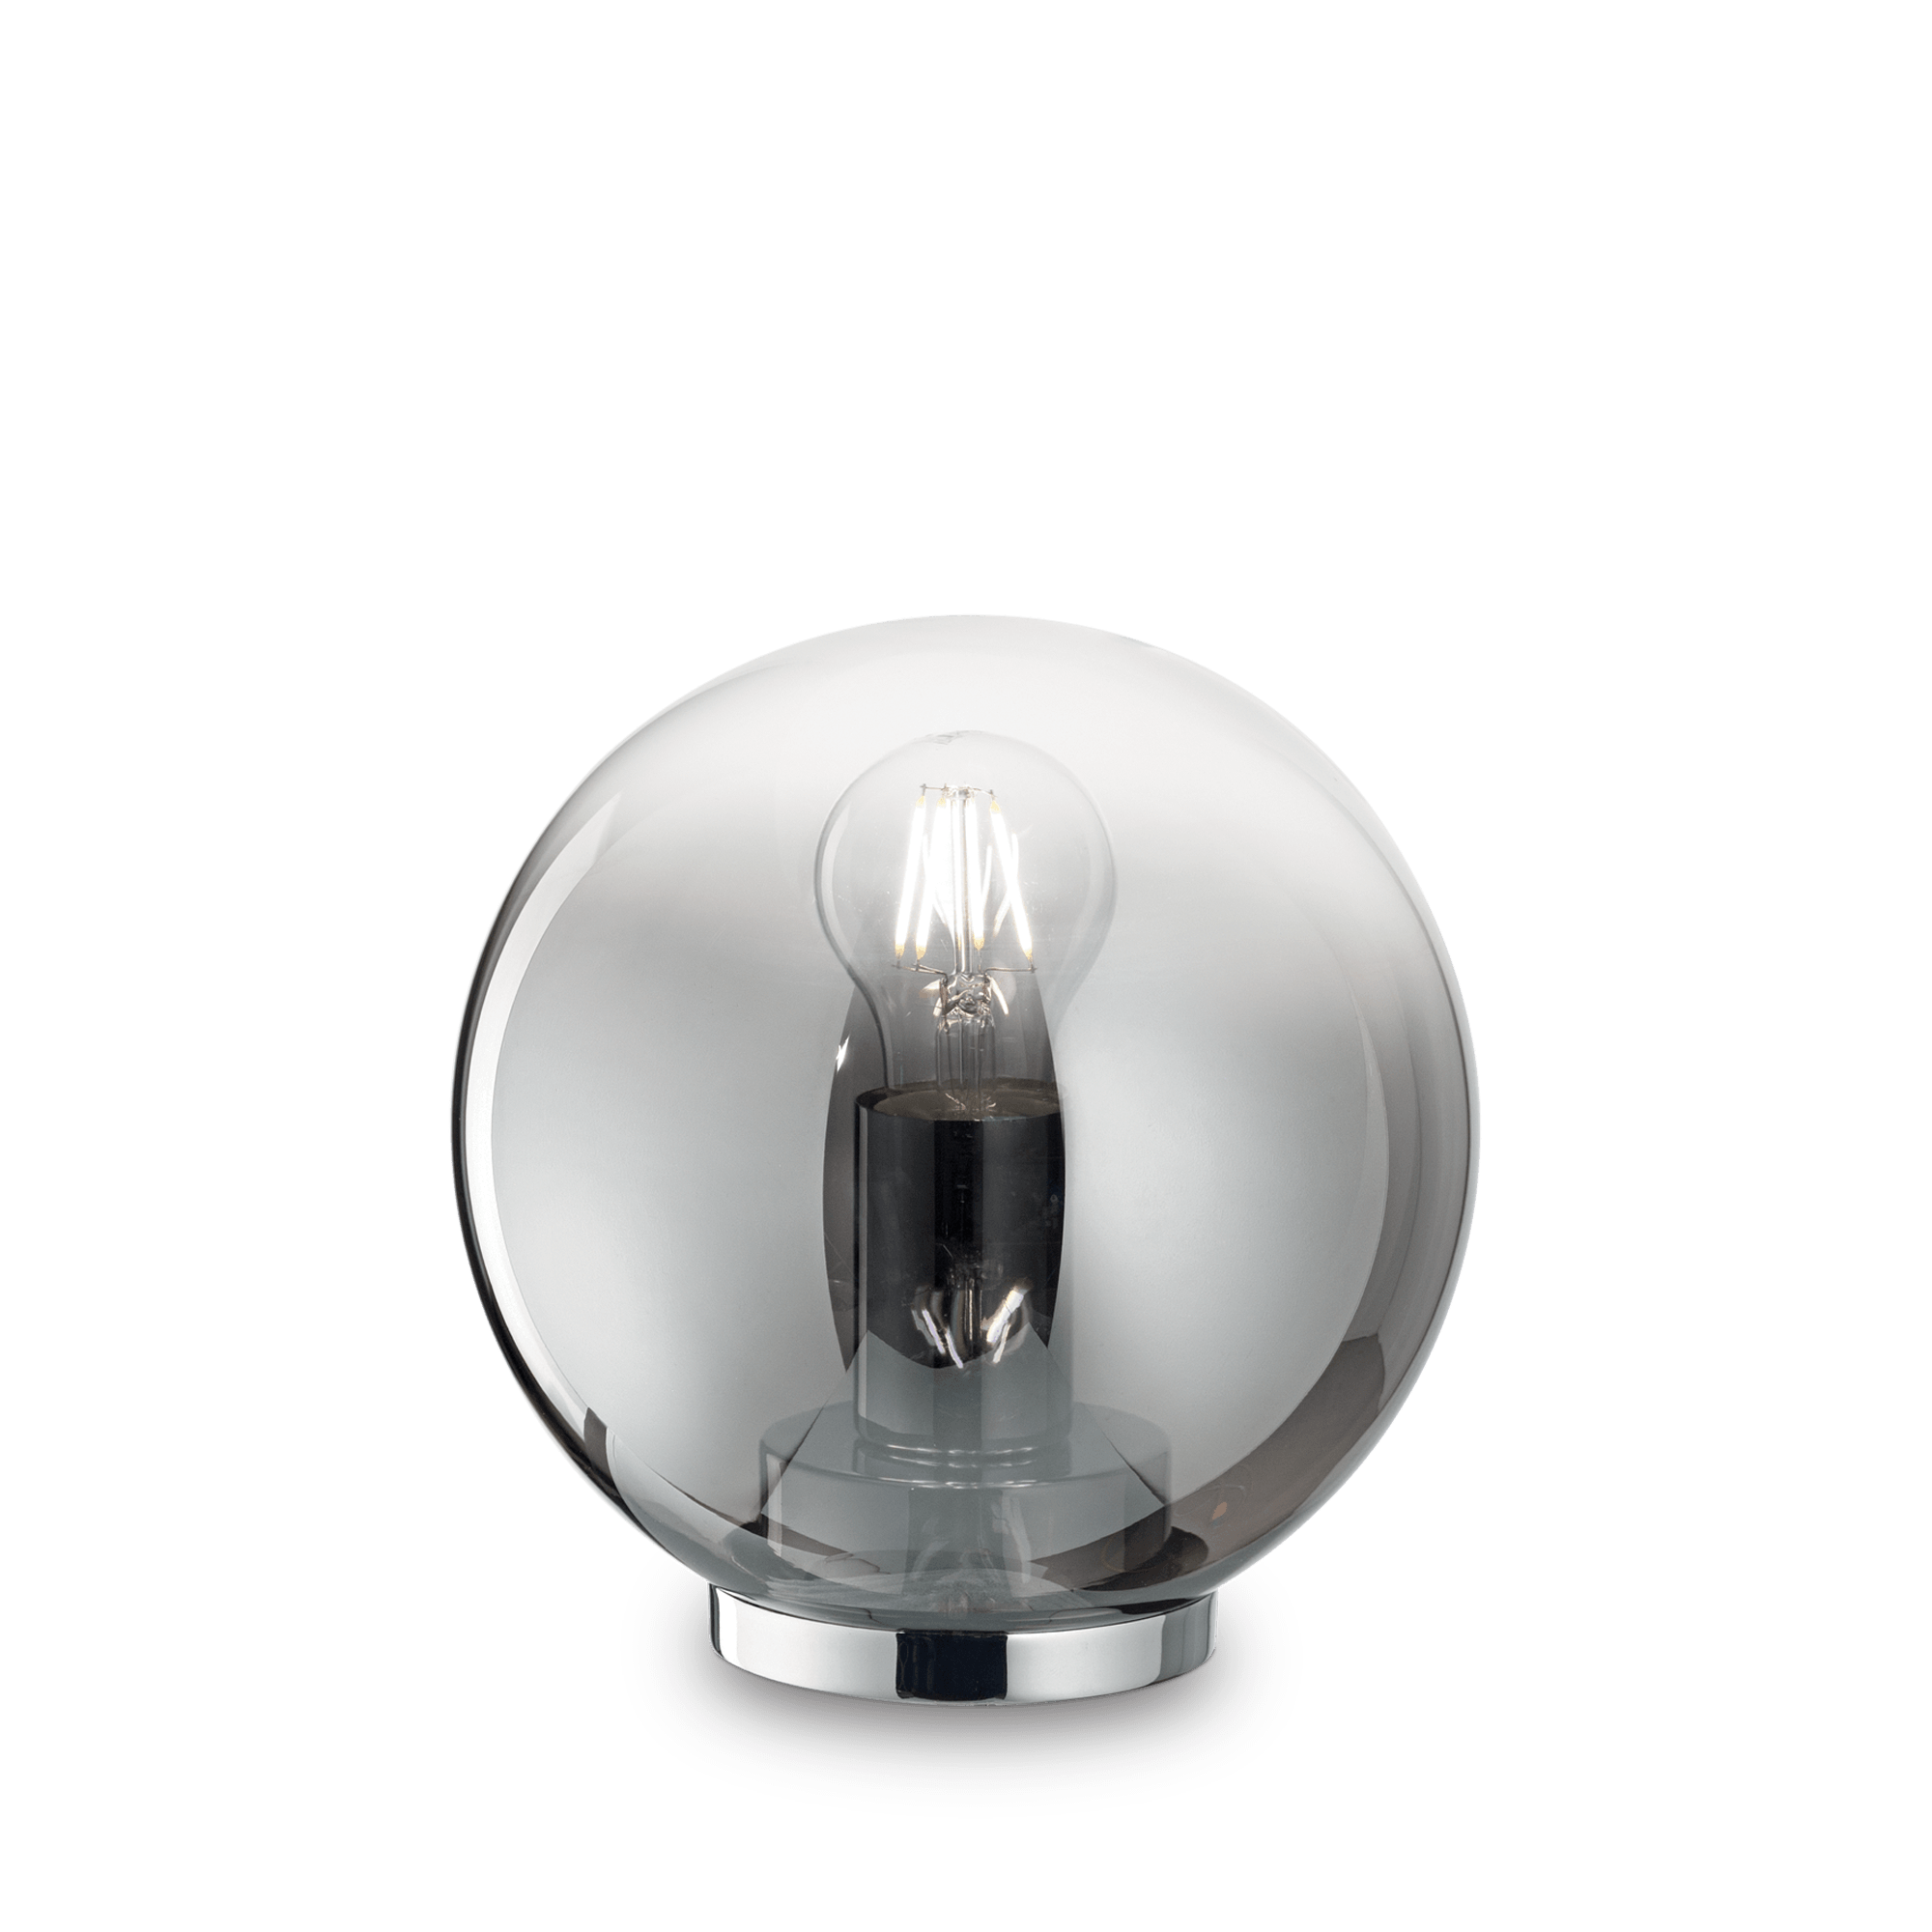 Ideal Lux 186863 MAPA FADE TL1 D20 asztali lámpa